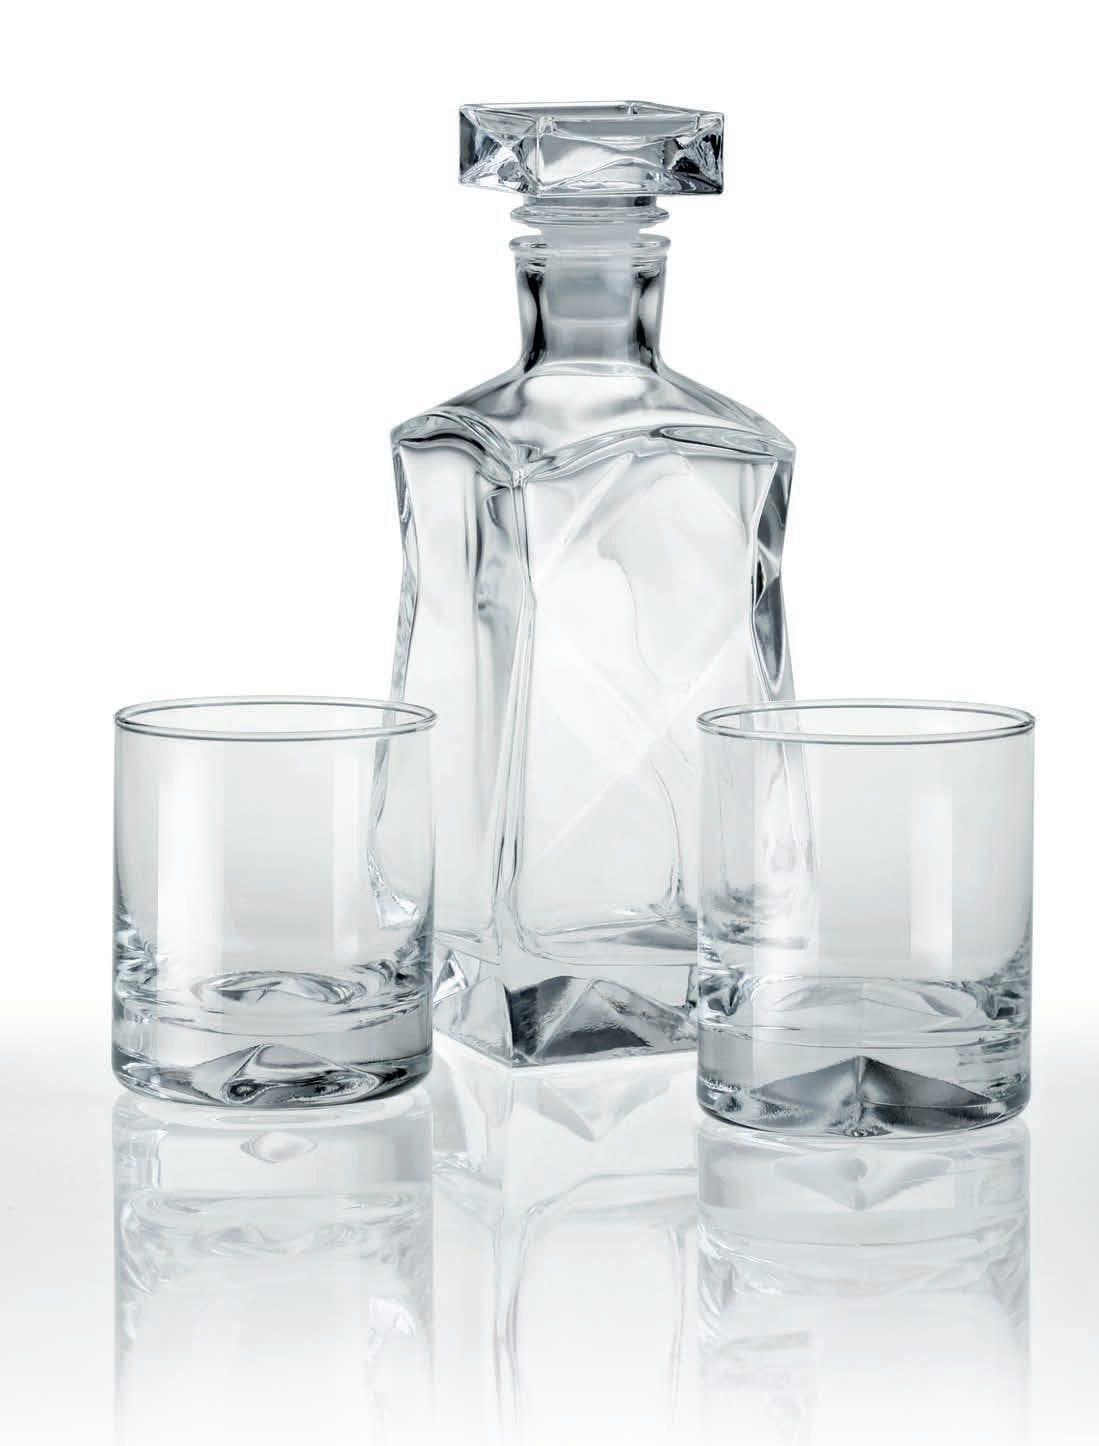 Zestaw karafka i szklanki do whisky z grawerem